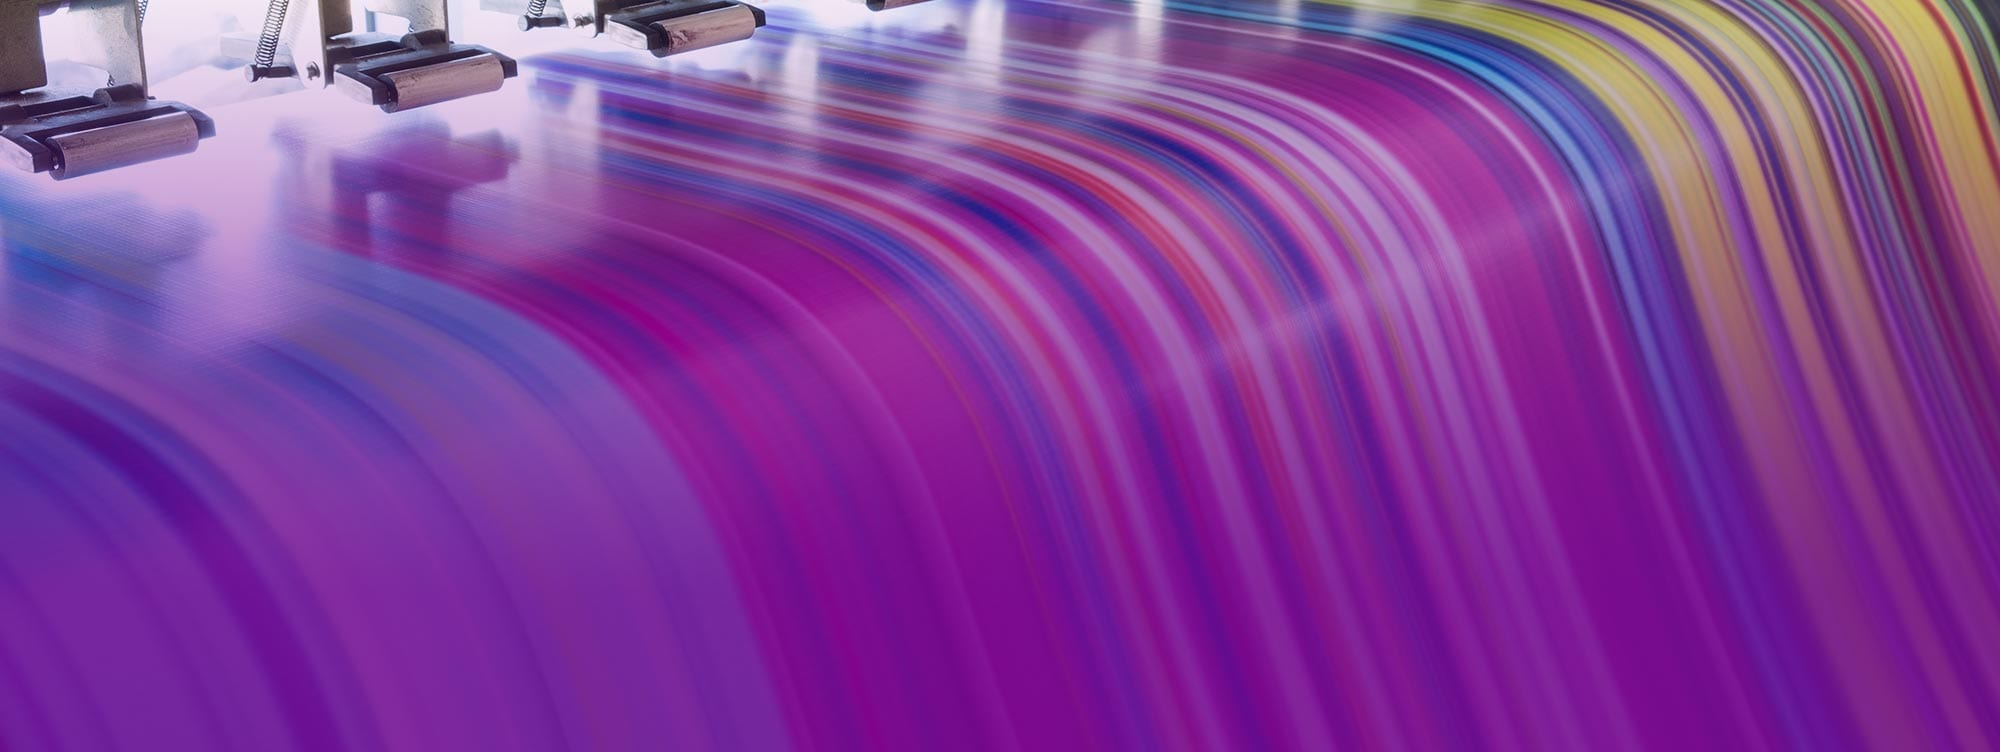 Slider Image - printer stripes of purple colors